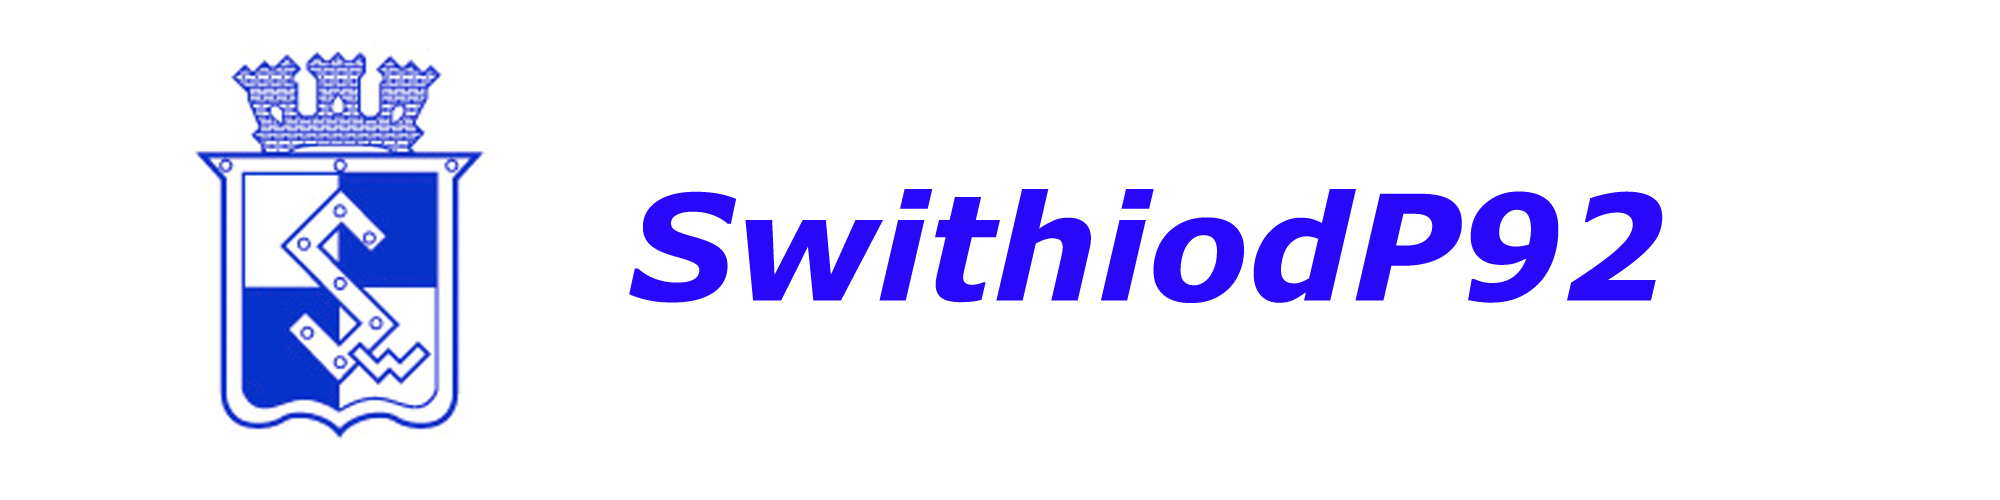 swithiod92.se